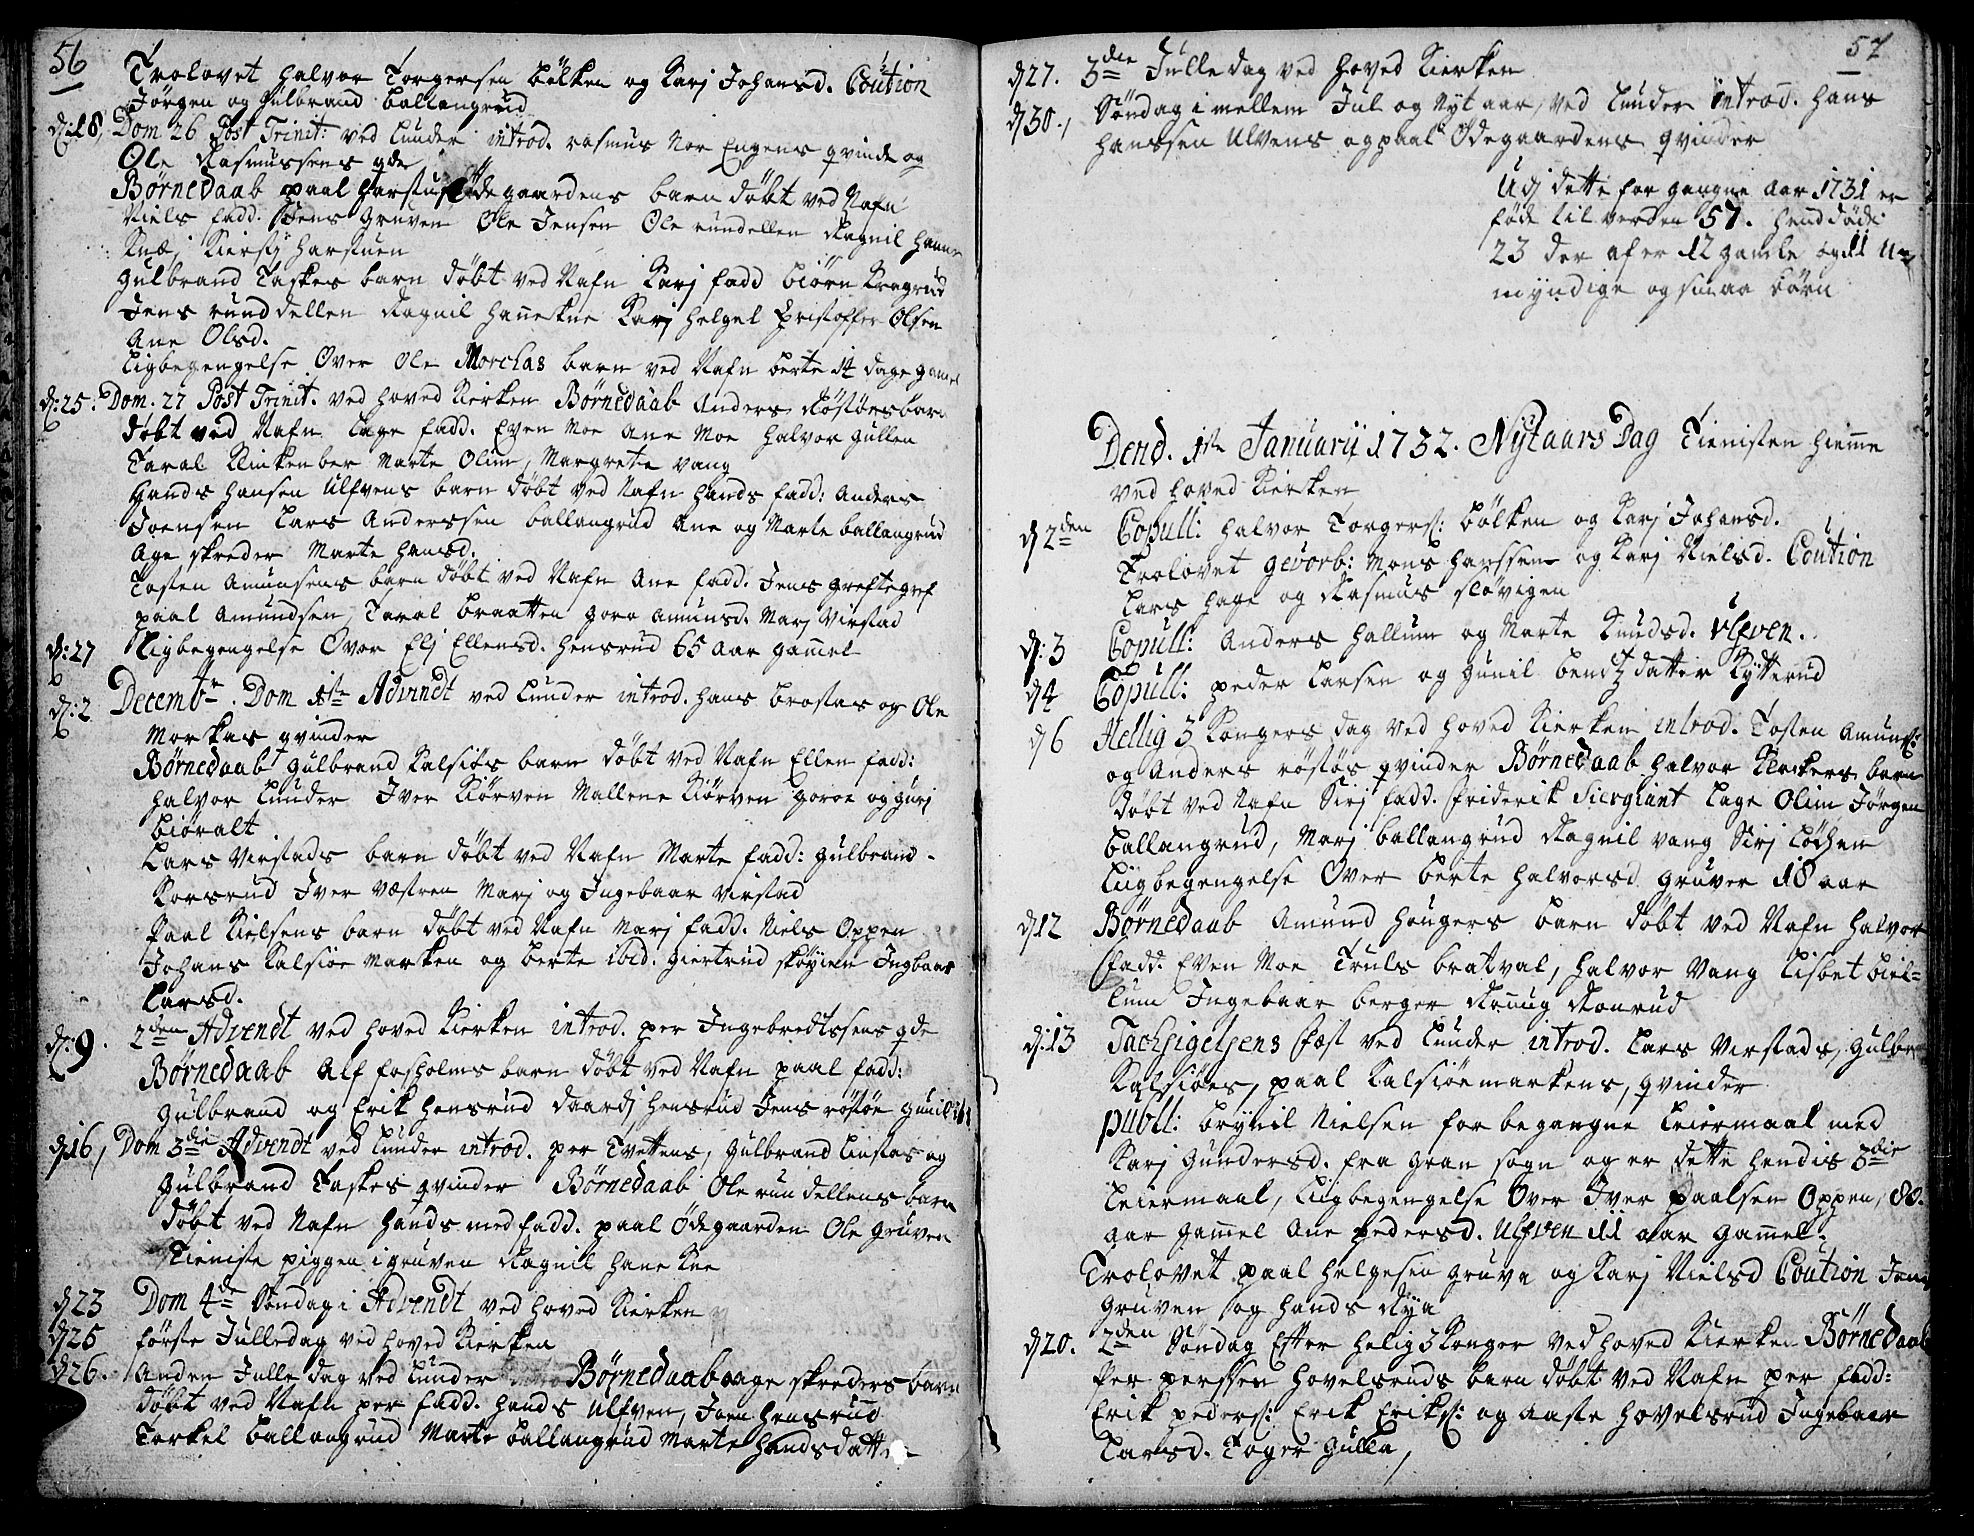 SAH, Jevnaker prestekontor, Ministerialbok nr. 2, 1725-1751, s. 56-57